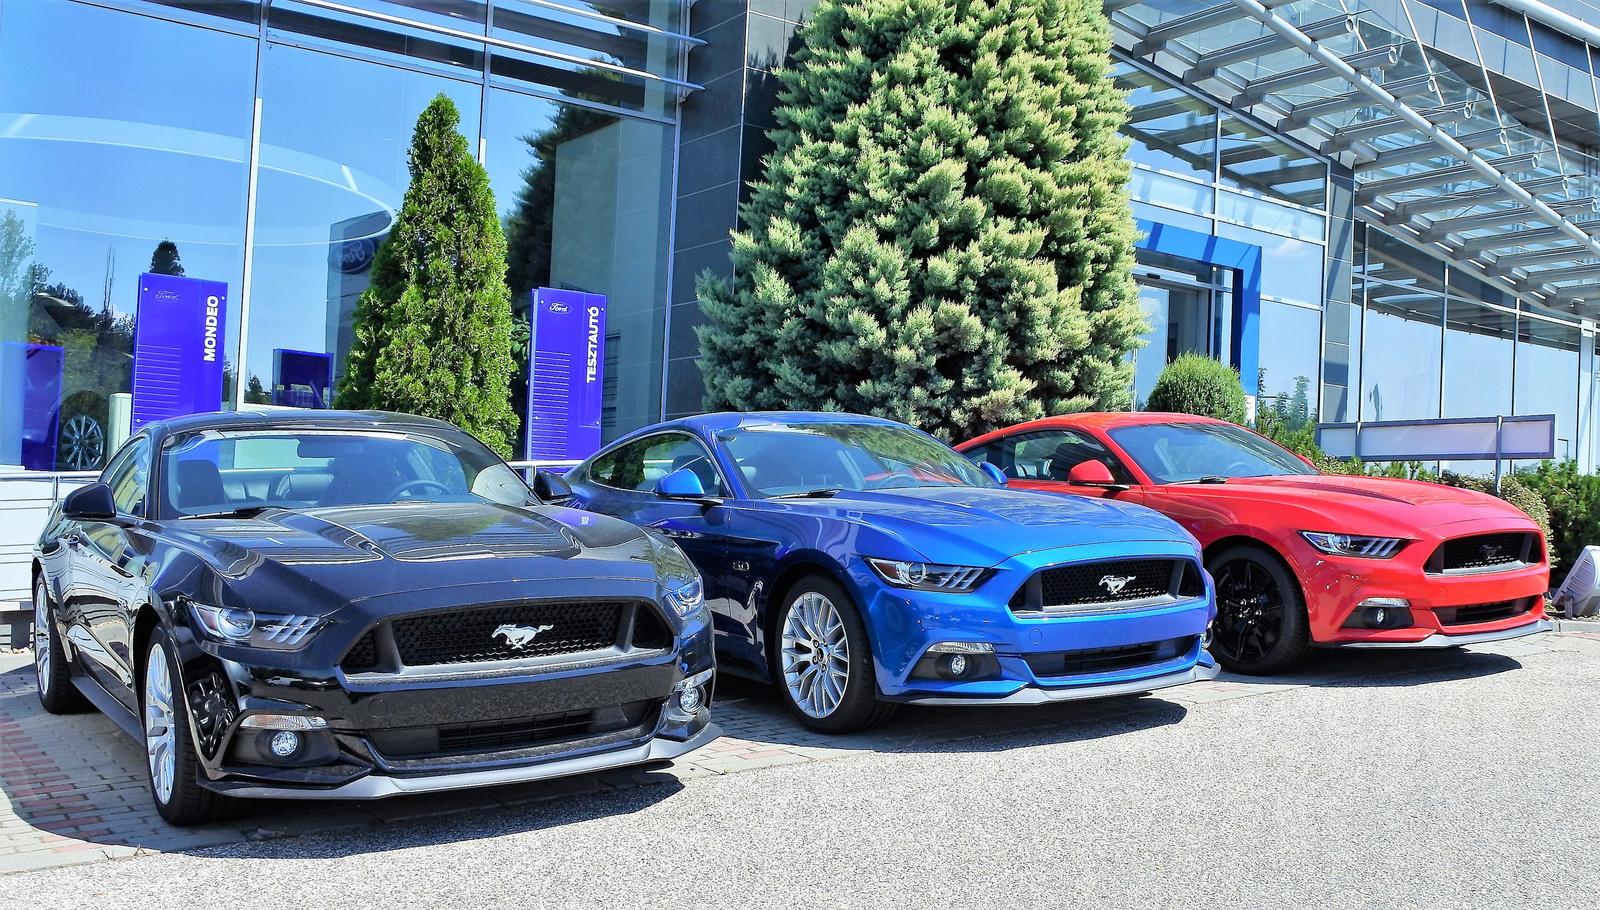 Mustang-sor